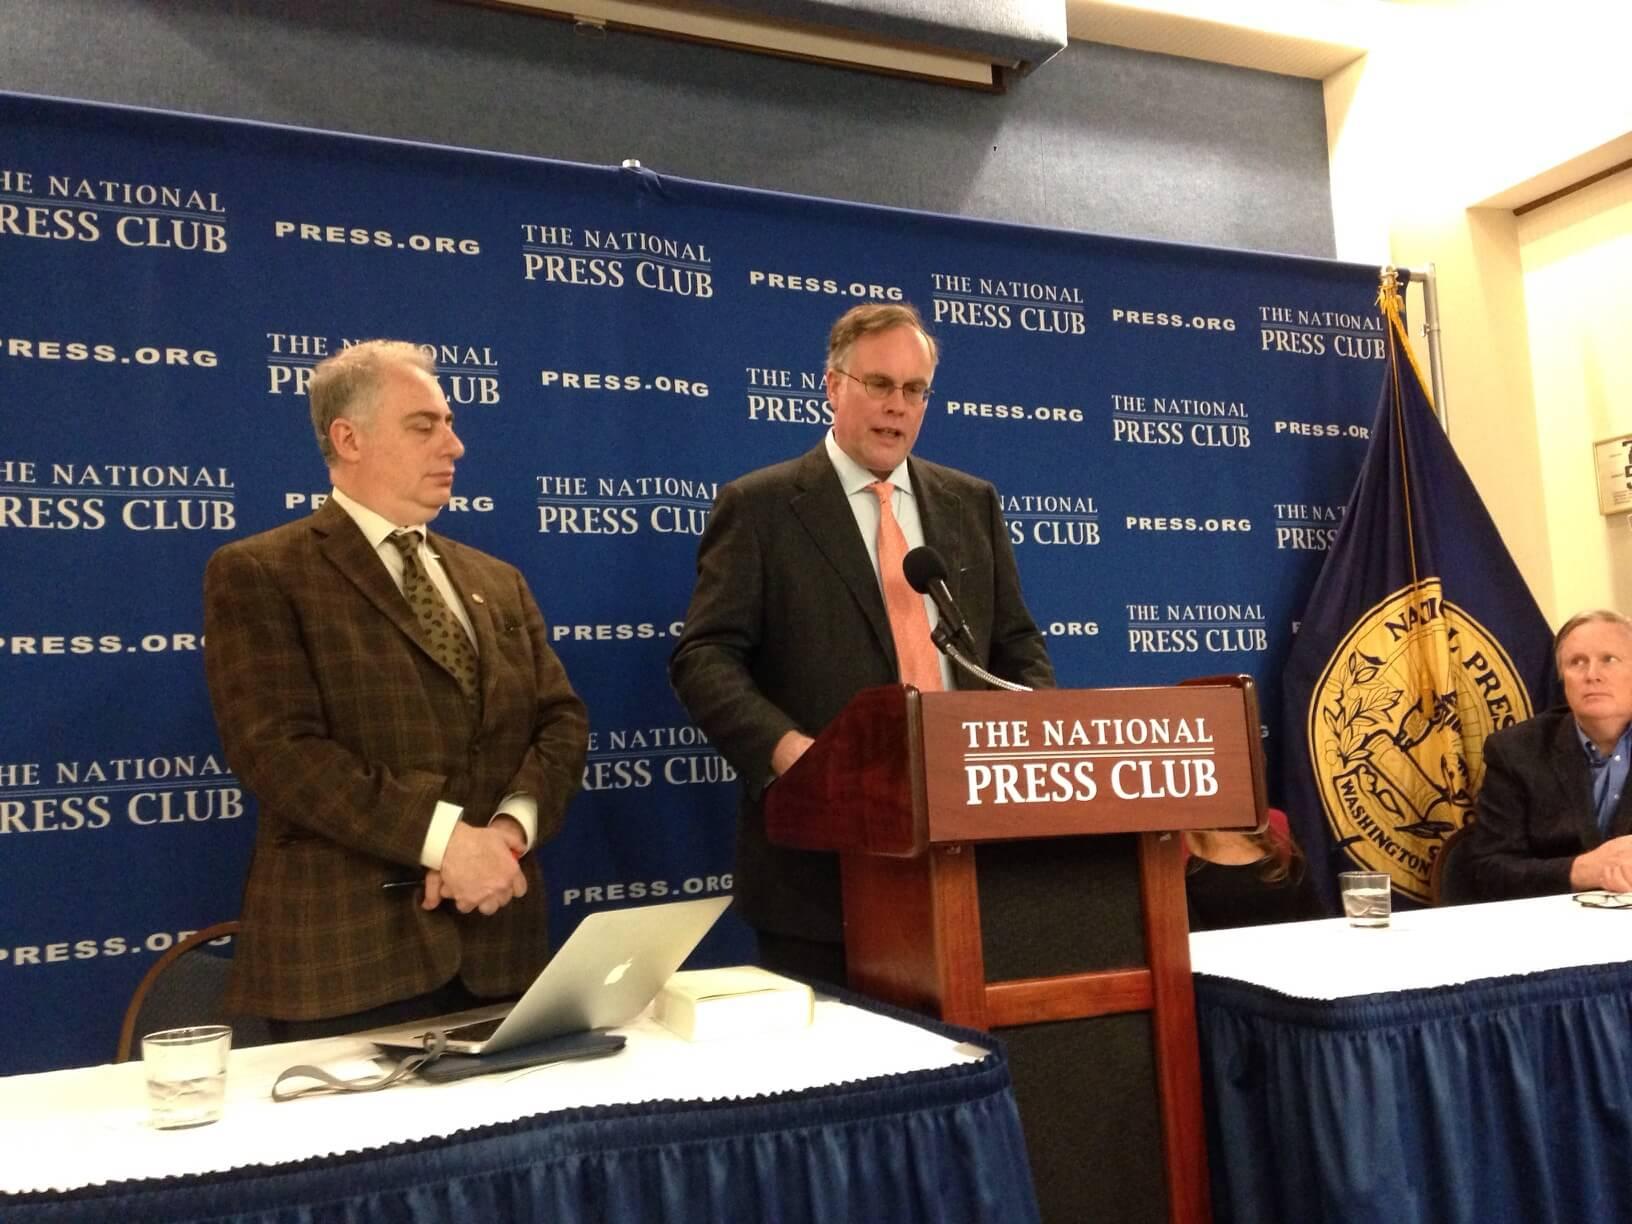 Presidential hopefuls should address autism, panelists say